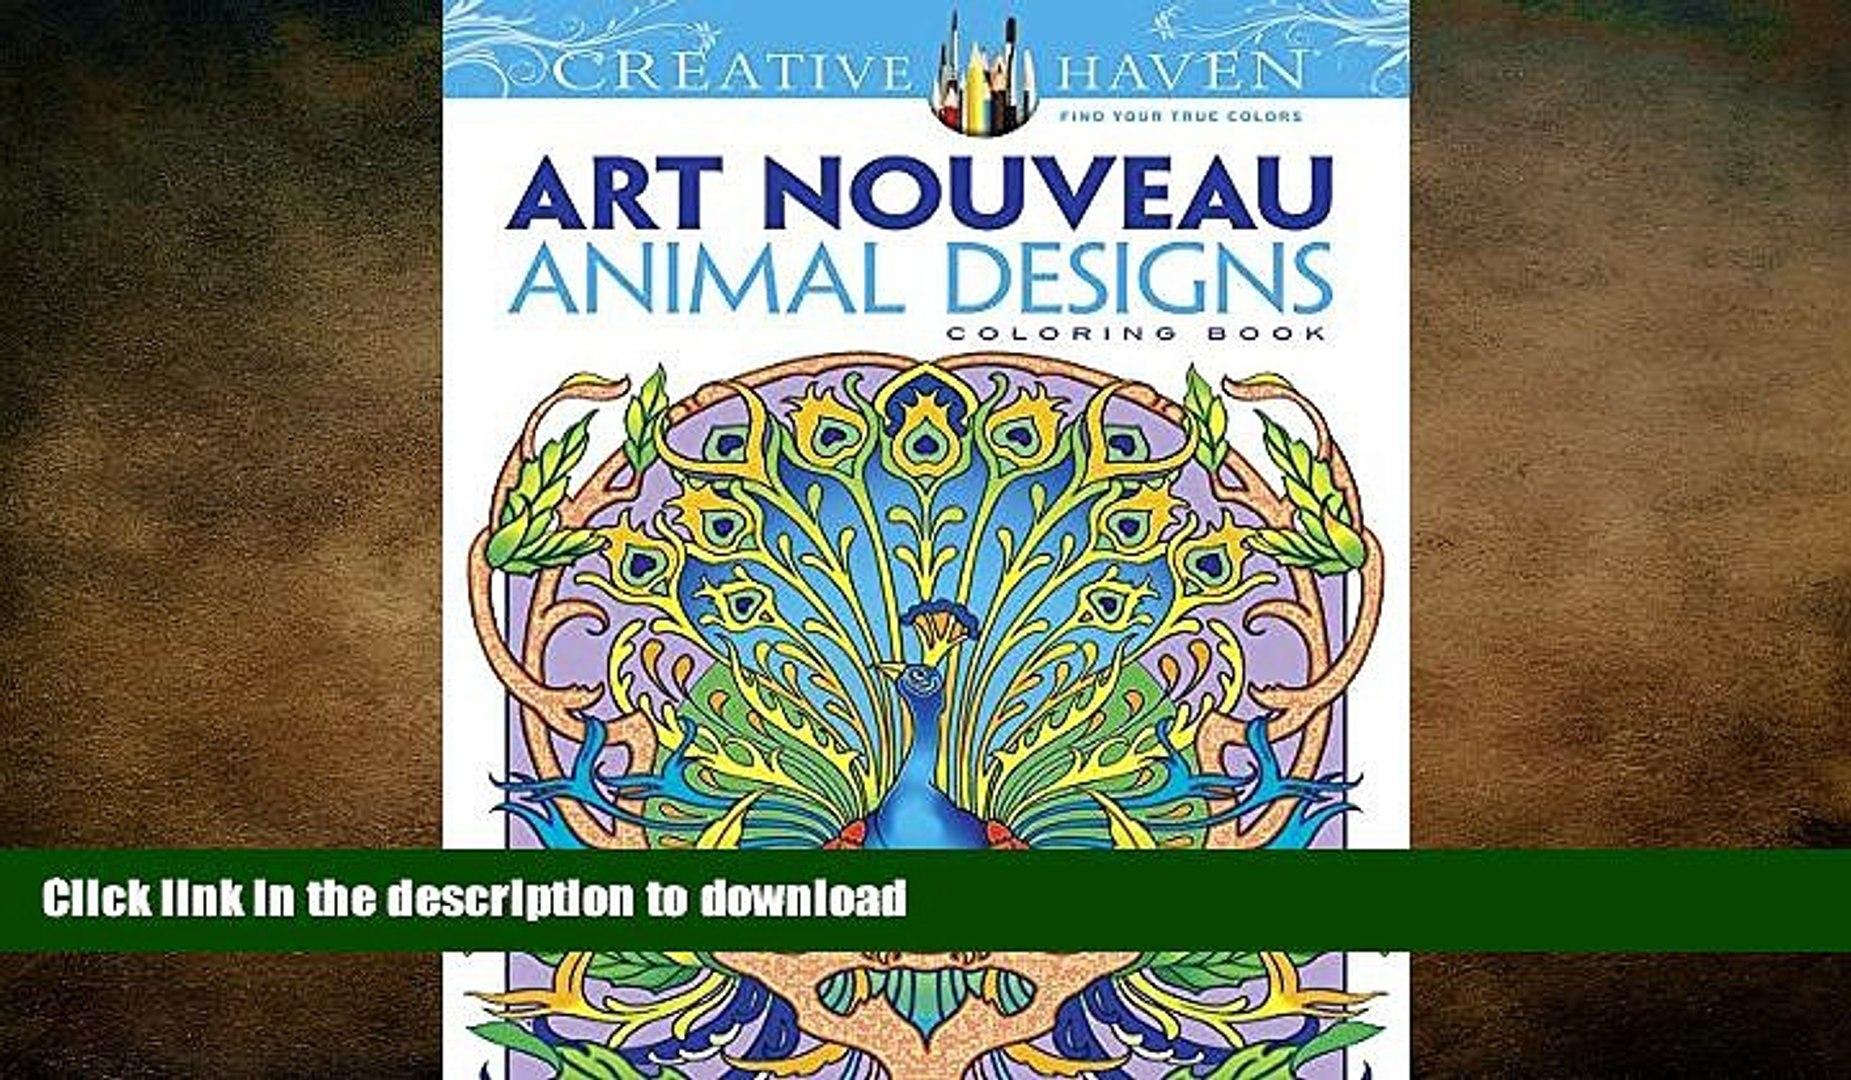 - READ BOOK Dover Creative Haven Art Nouveau Animal Designs Coloring